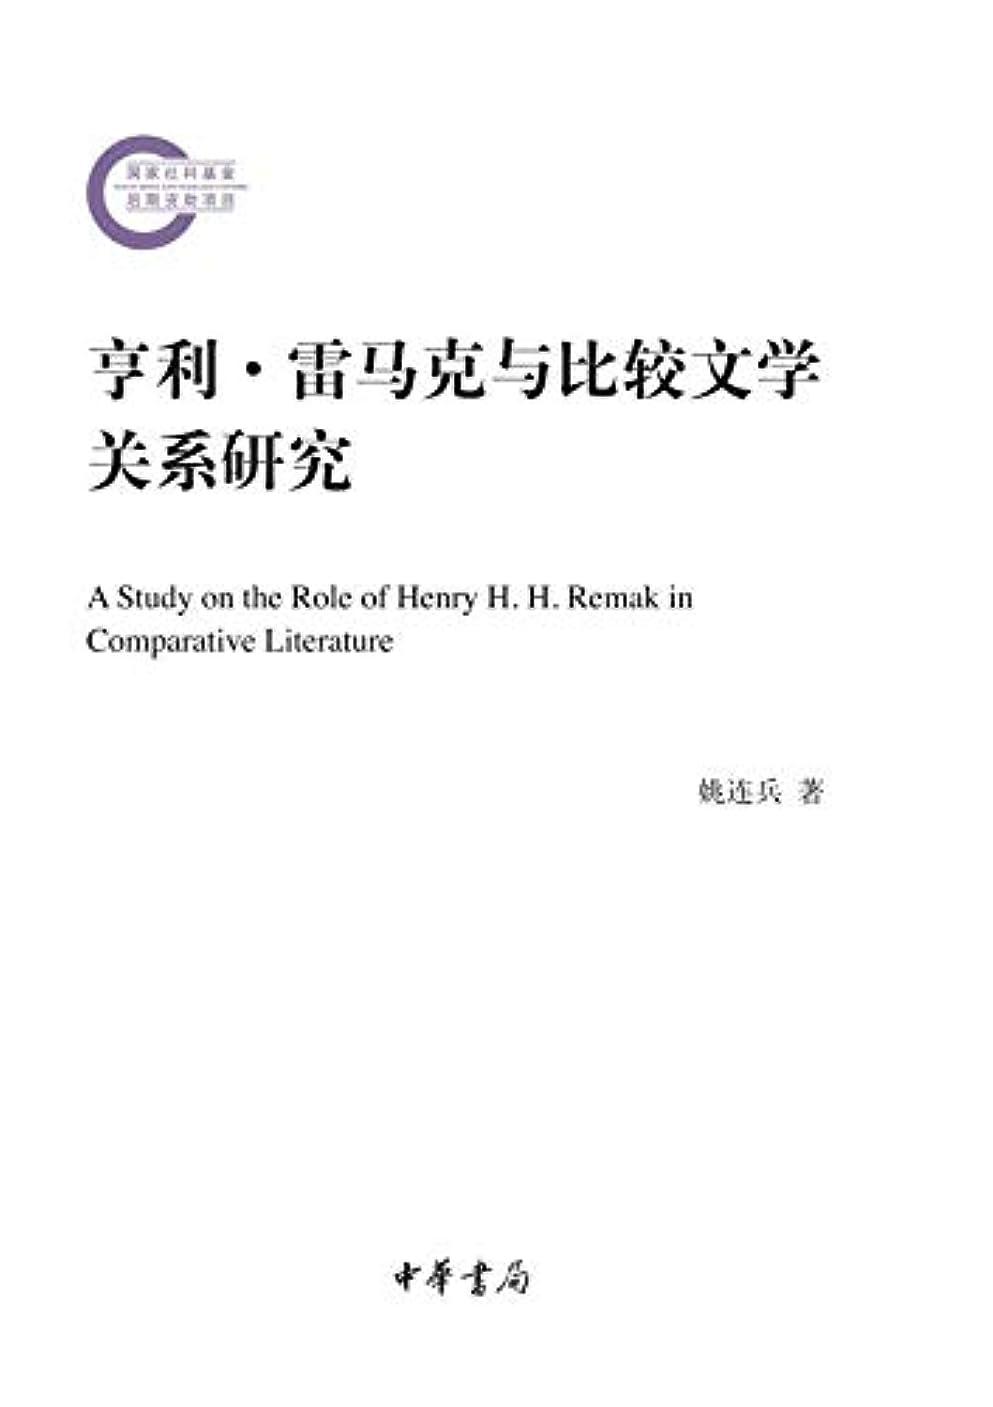 クラフト九時四十五分ほんの亨利·雷马克与比较文学关系研究--国家社科基金后期资助项目 (Chinese Edition)